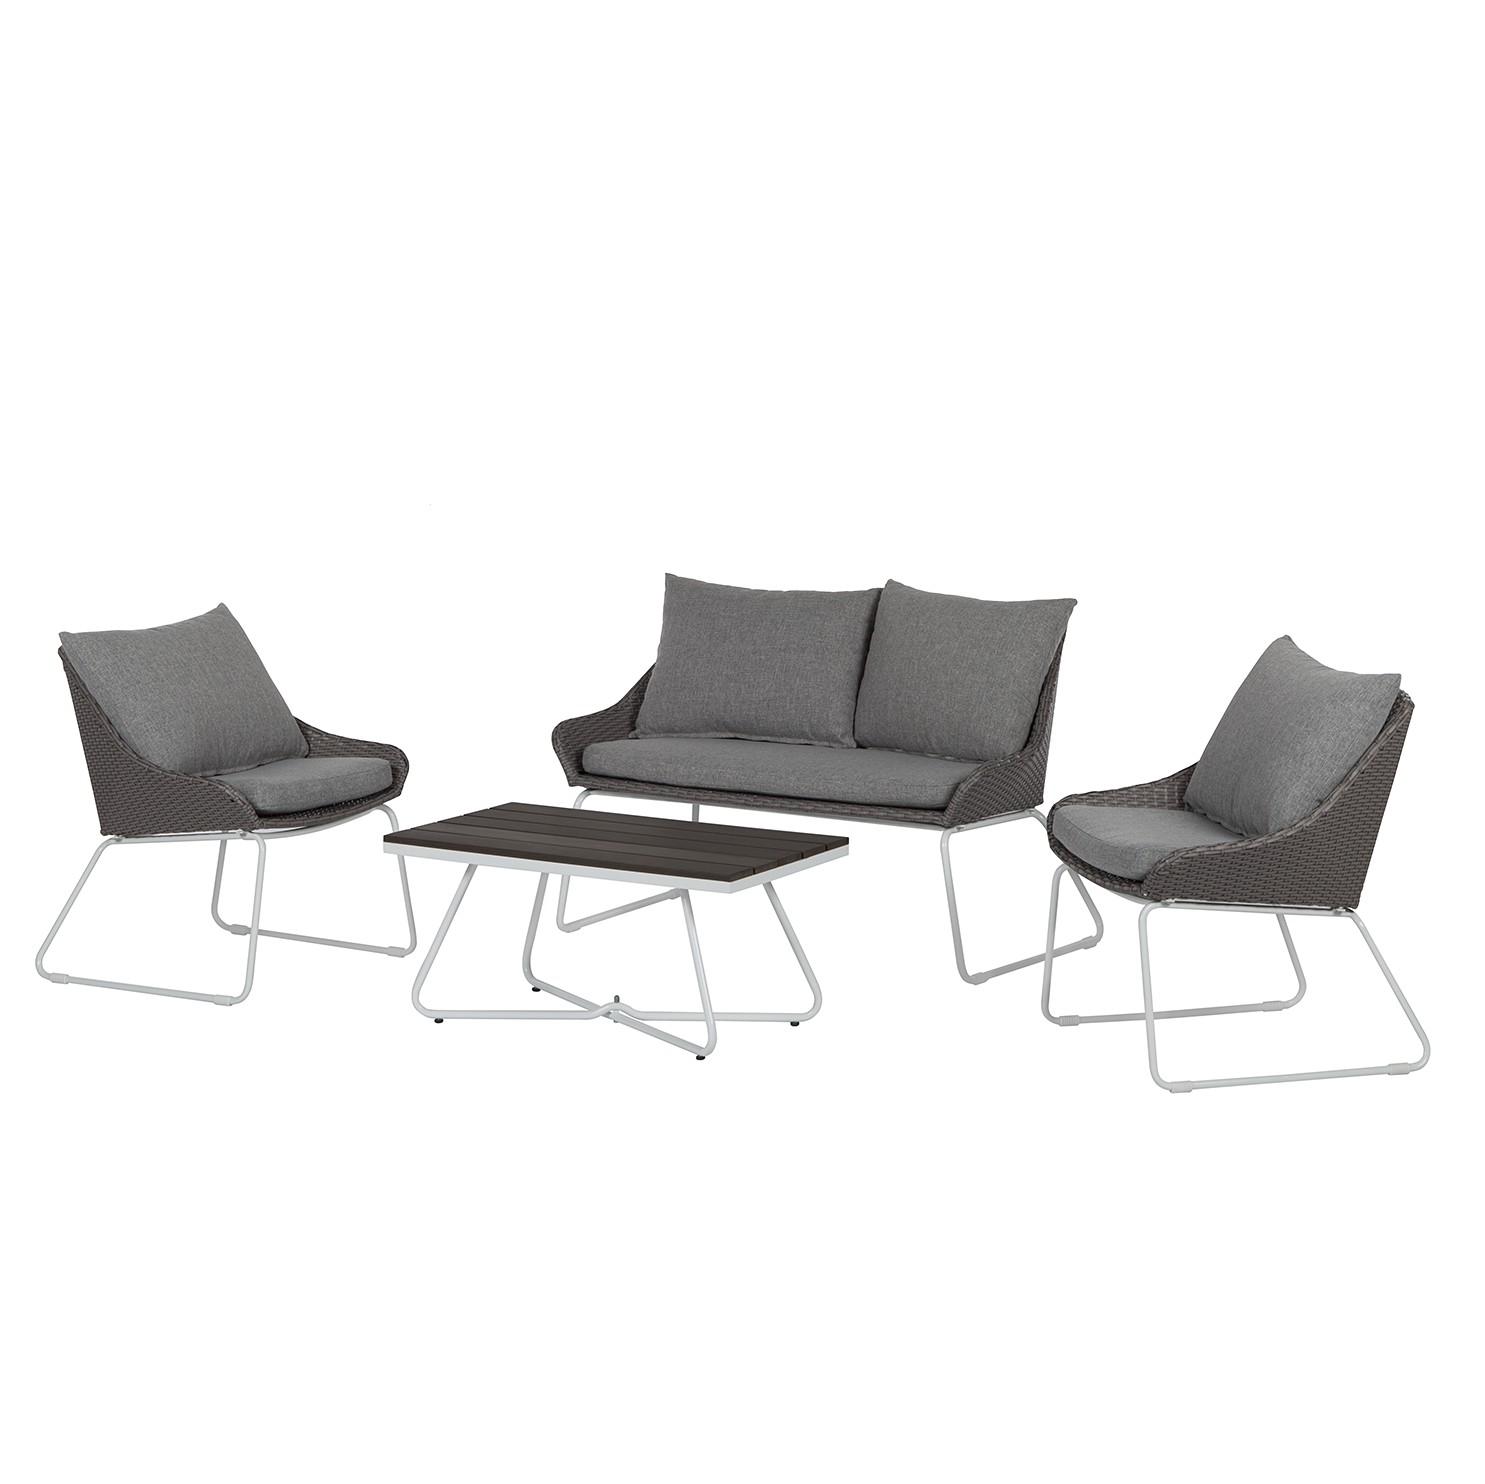 Lounge-Set Gran Rey (4-teilig) - Rattan / Stahl - Grau, Fredriks bei Home24 - Gartenmöbel